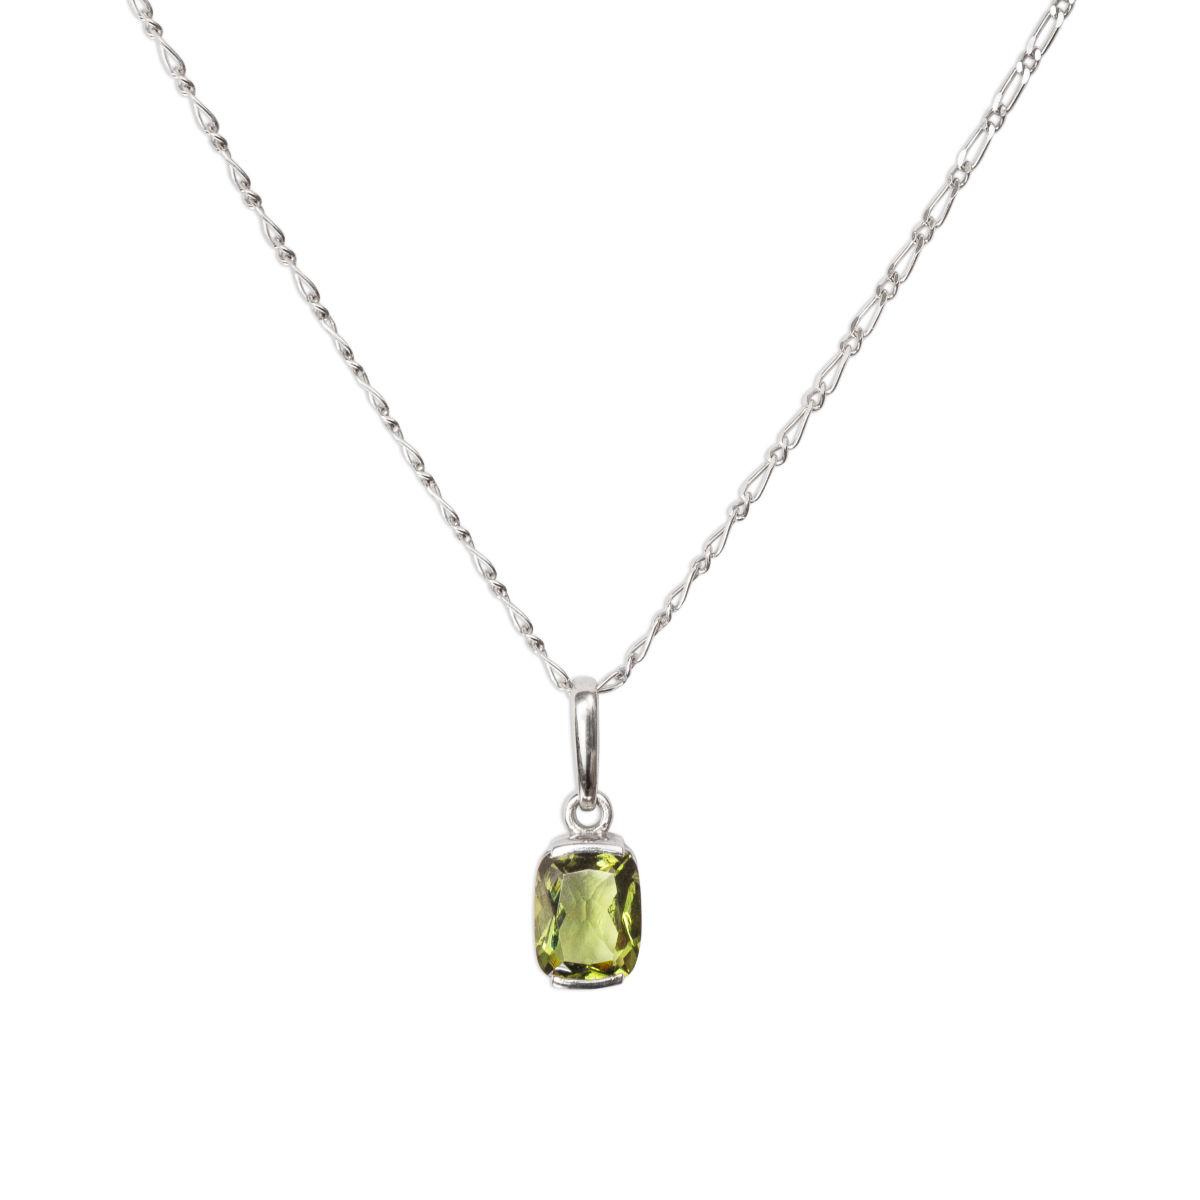 Stříbrný náhrdelník svltavínem